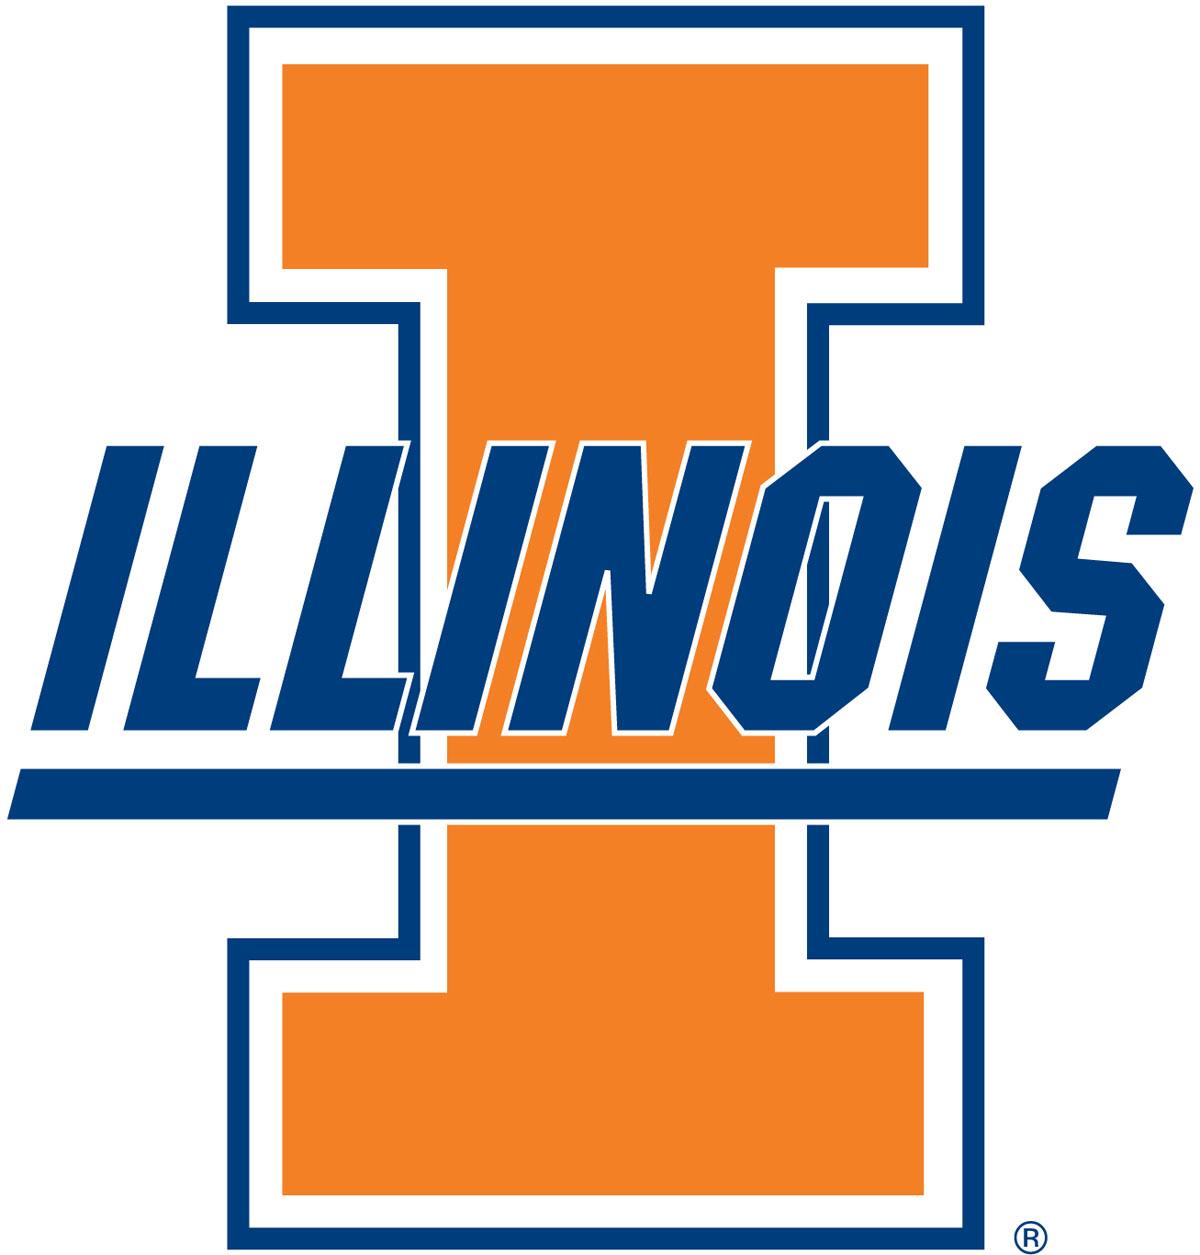 Illinois Fighting Illini Football Wallpaper   Big Ten Football Online 1200x1255